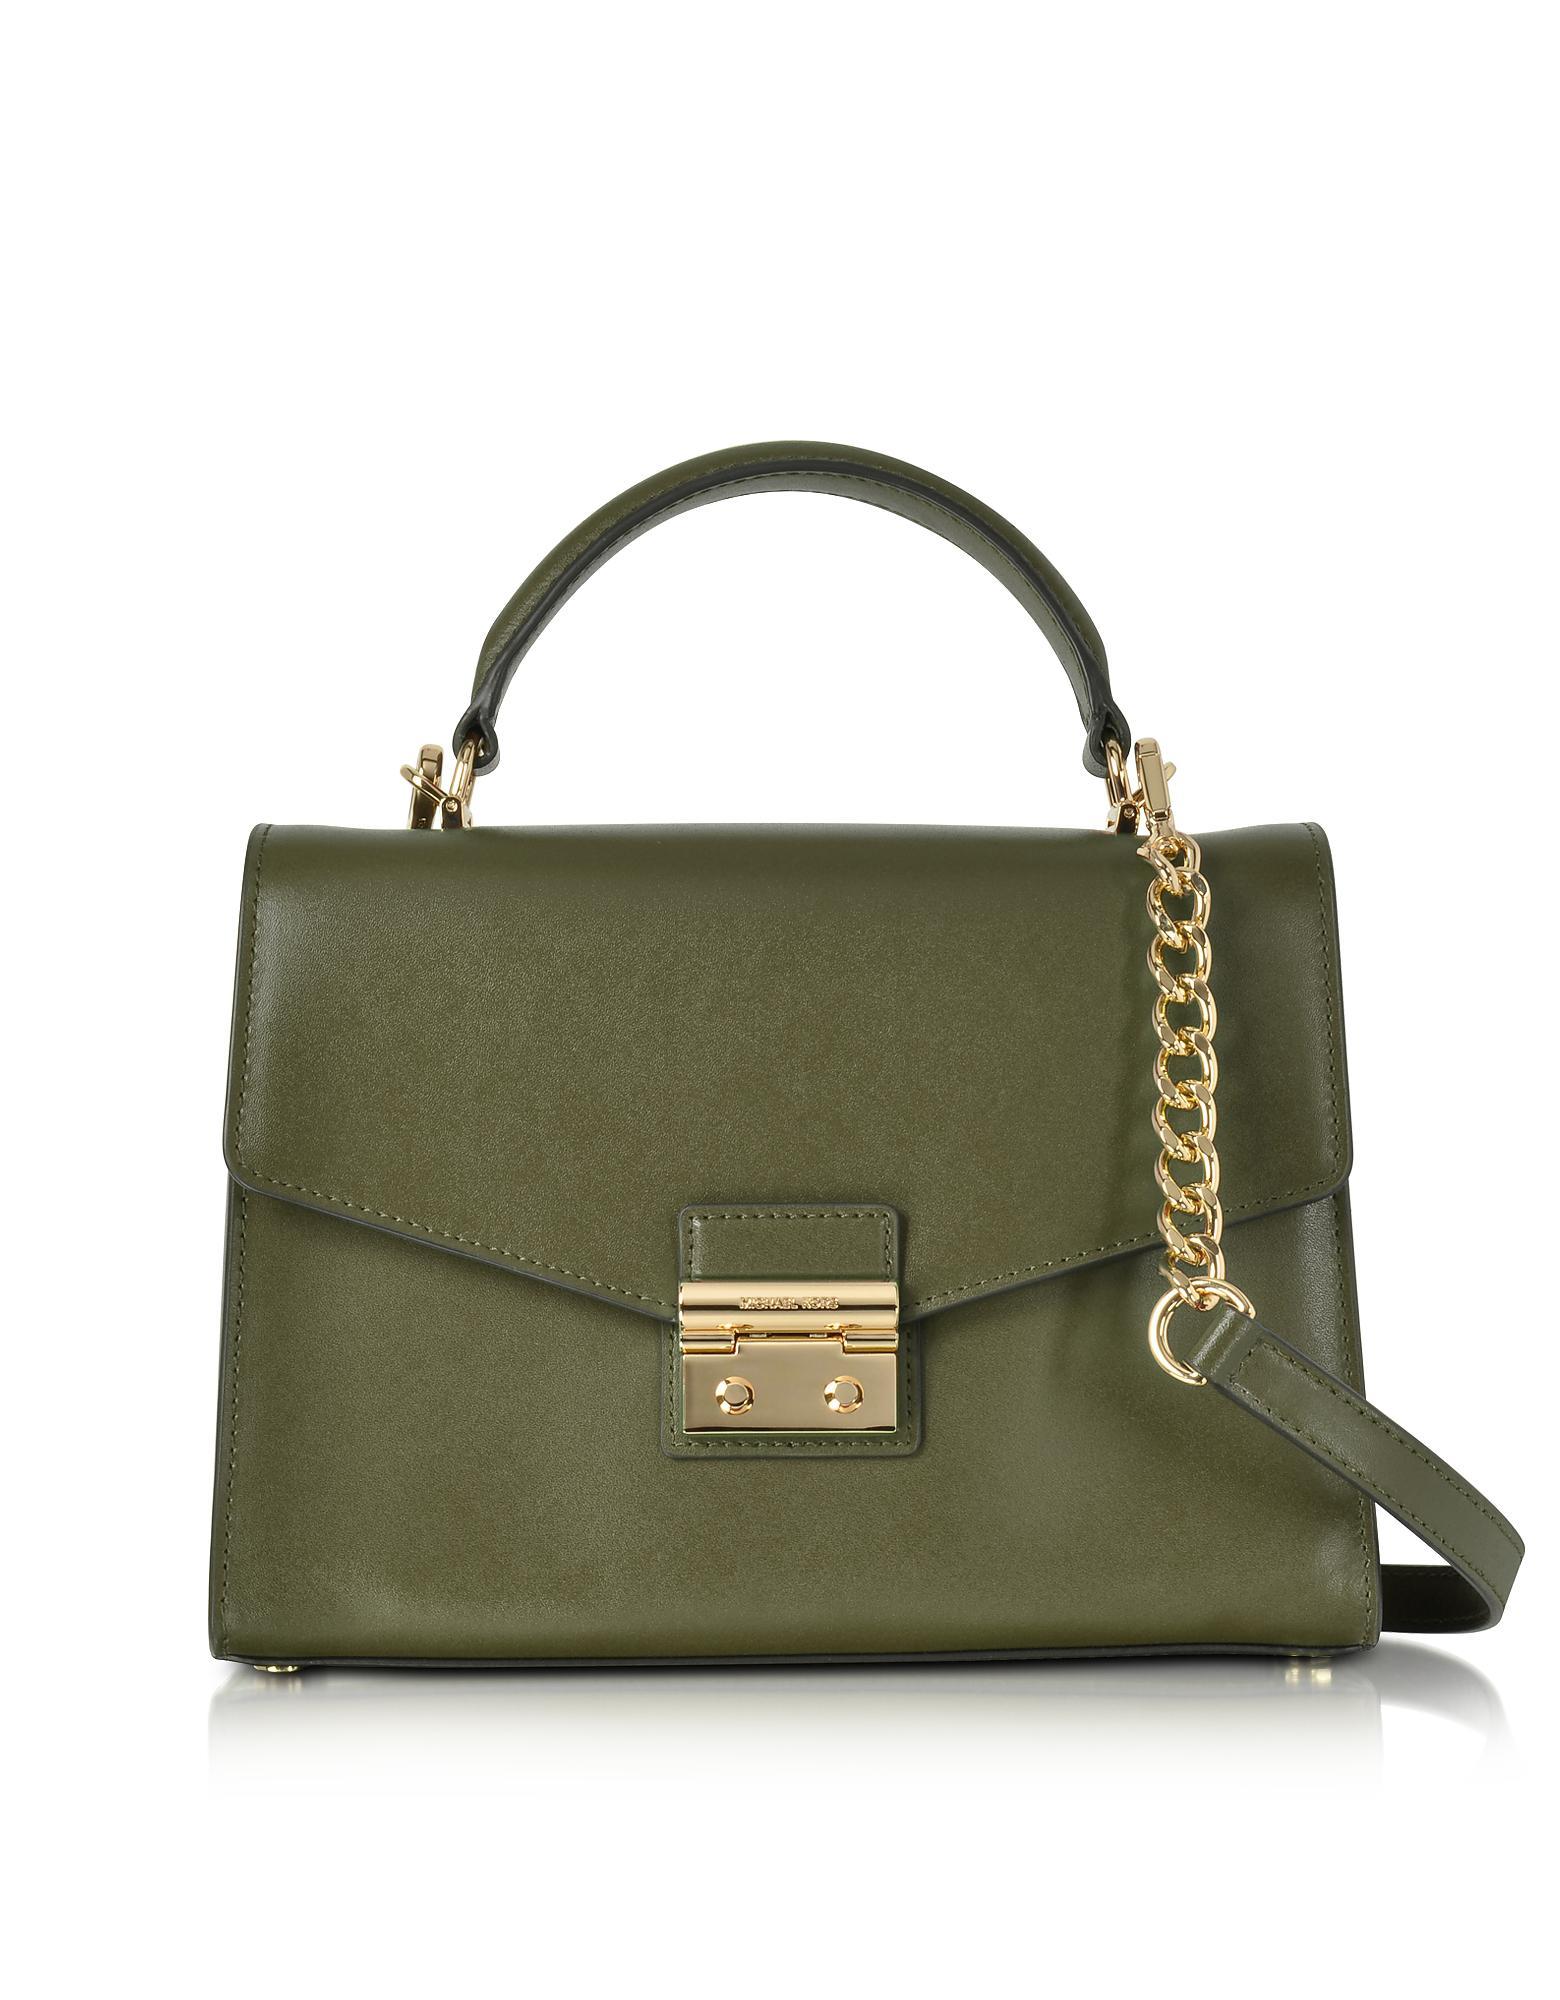 63d040ce1425 Lyst - Michael Kors Sloan Medium Olive Leather Satchel Bag in Green